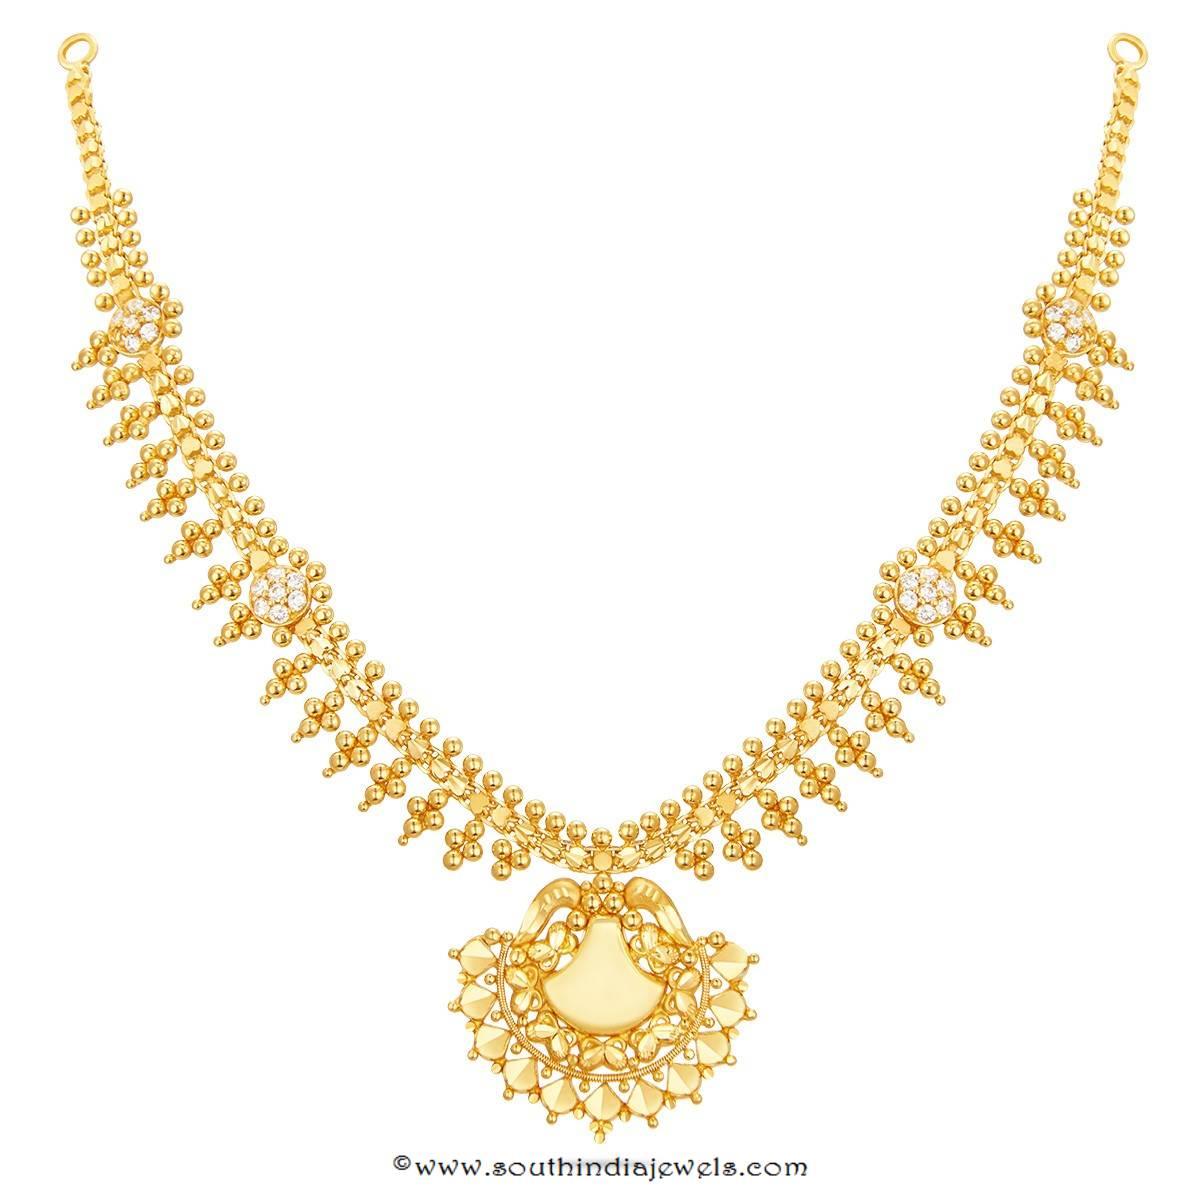 Carat Diamond Price In Rupees